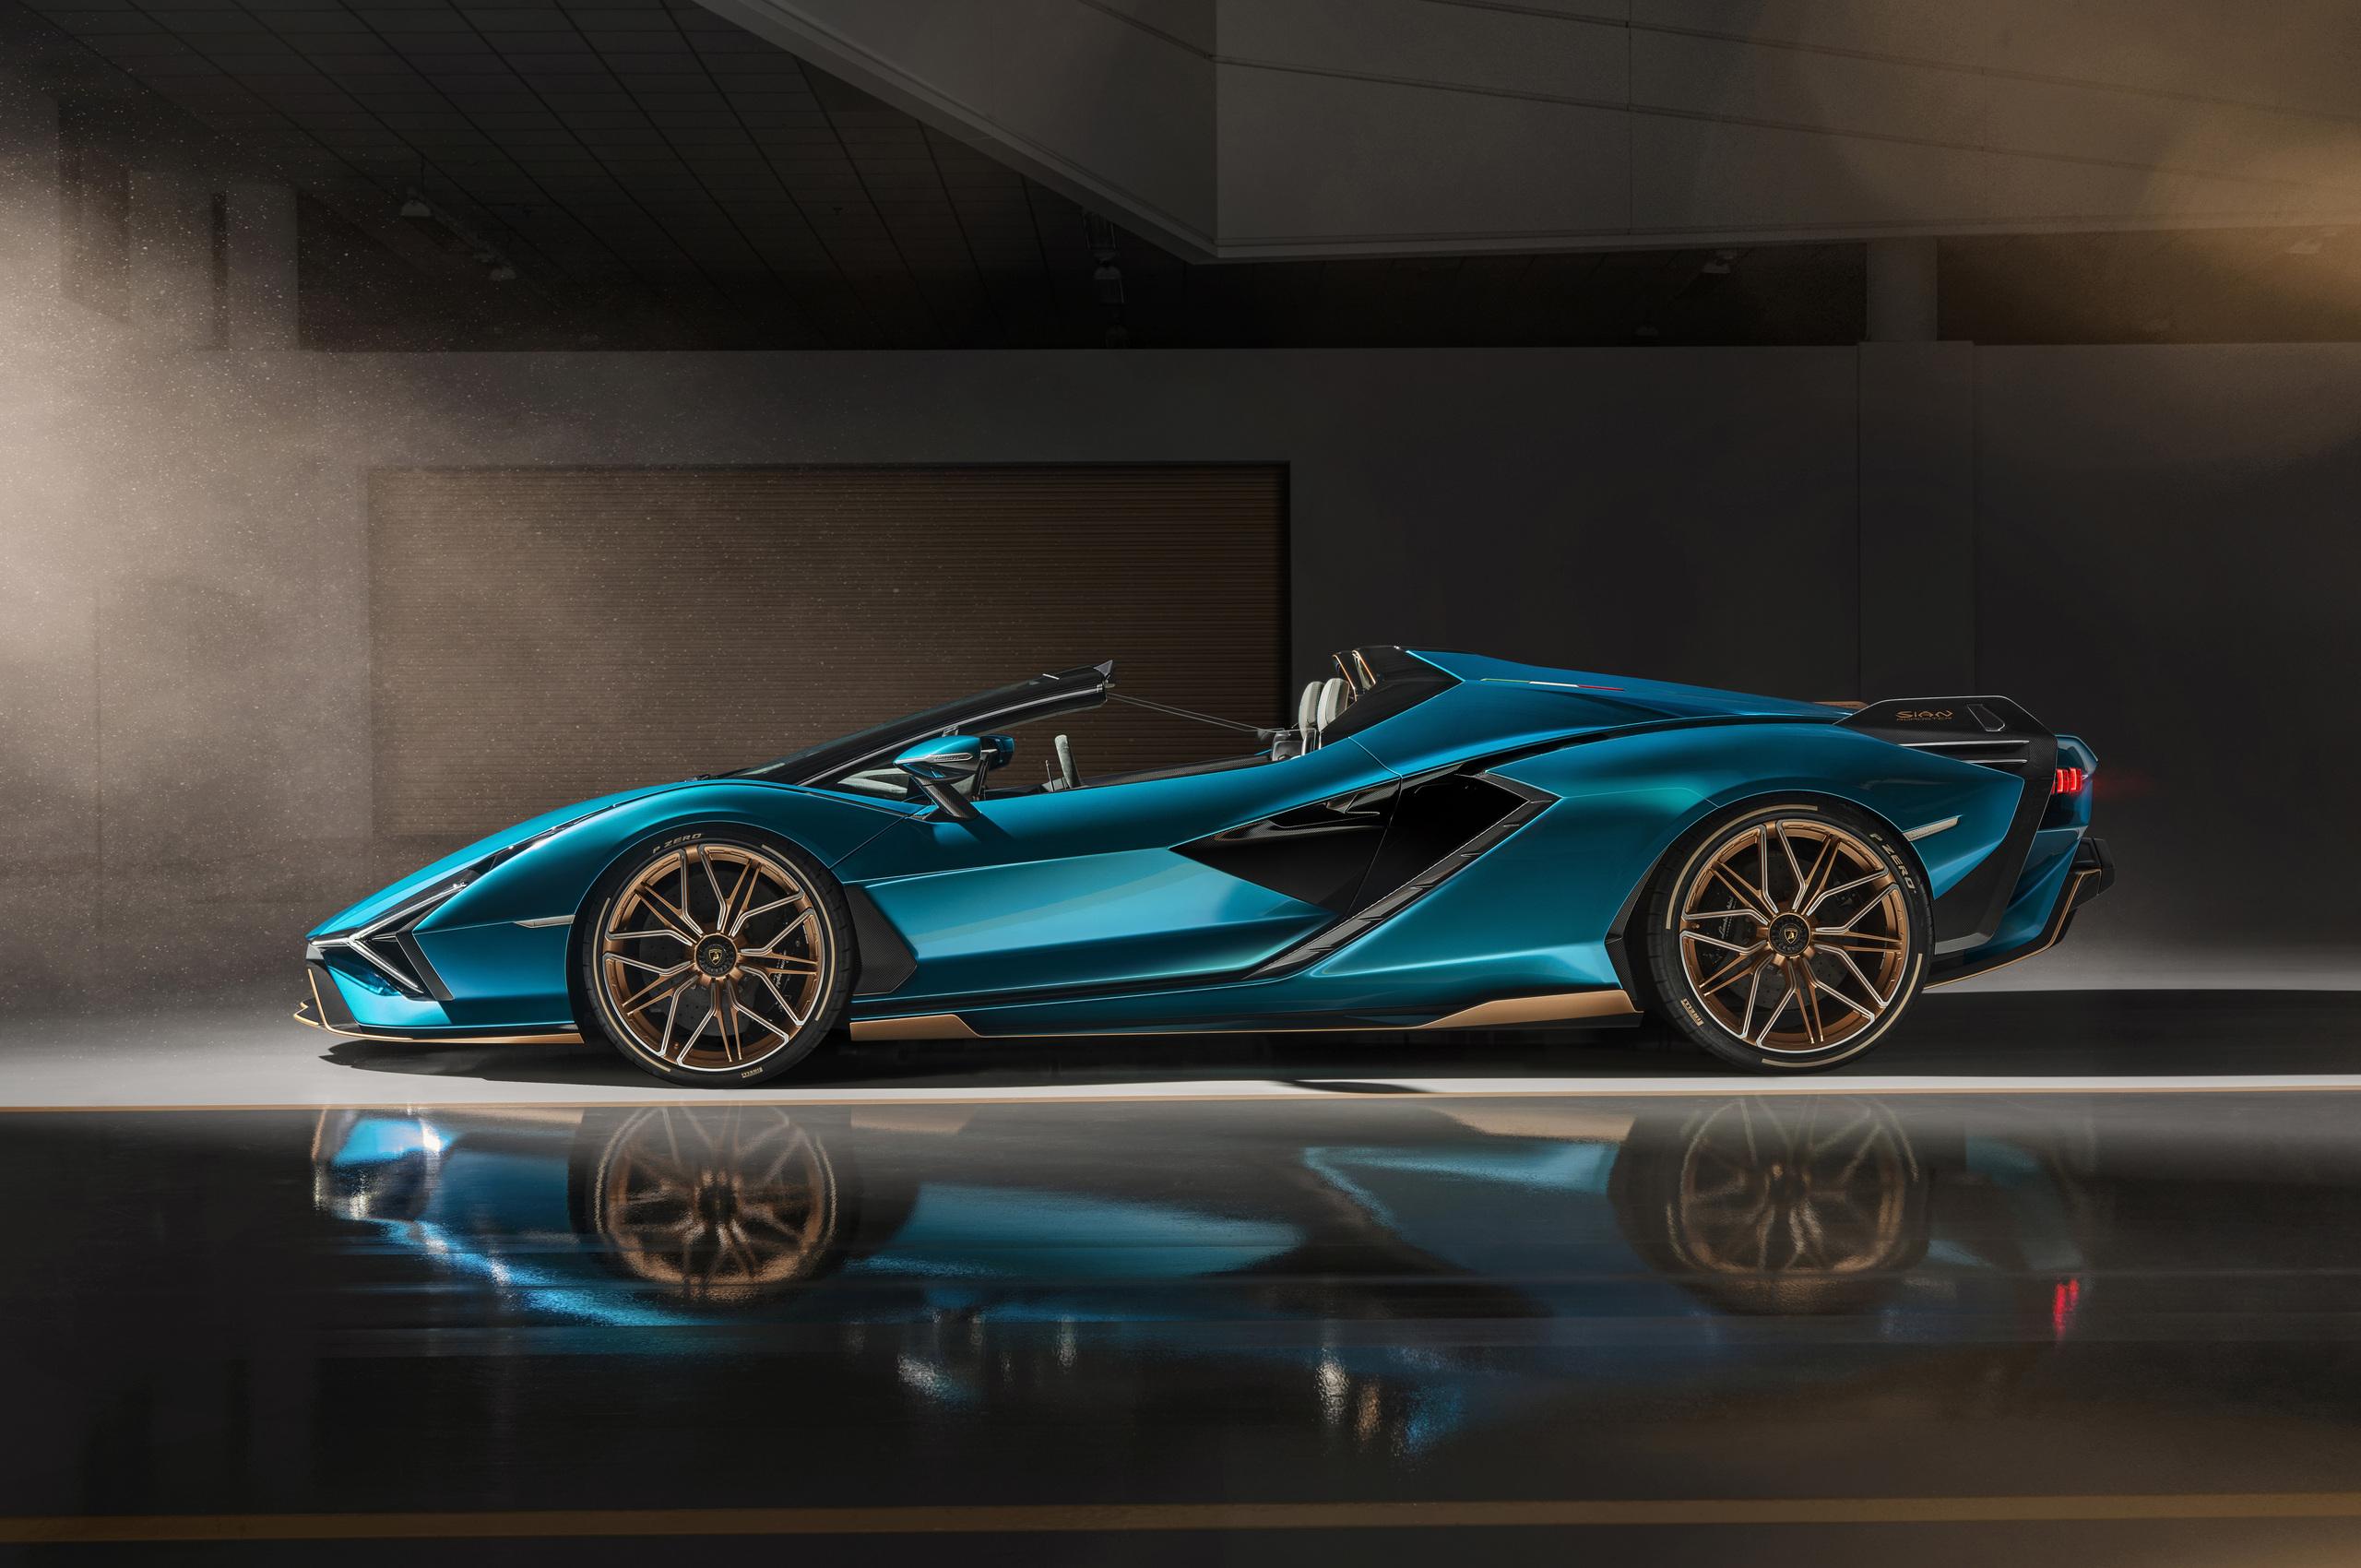 2560x1700 Lamborghini Sian Roadster 2020 Side View 8k ...